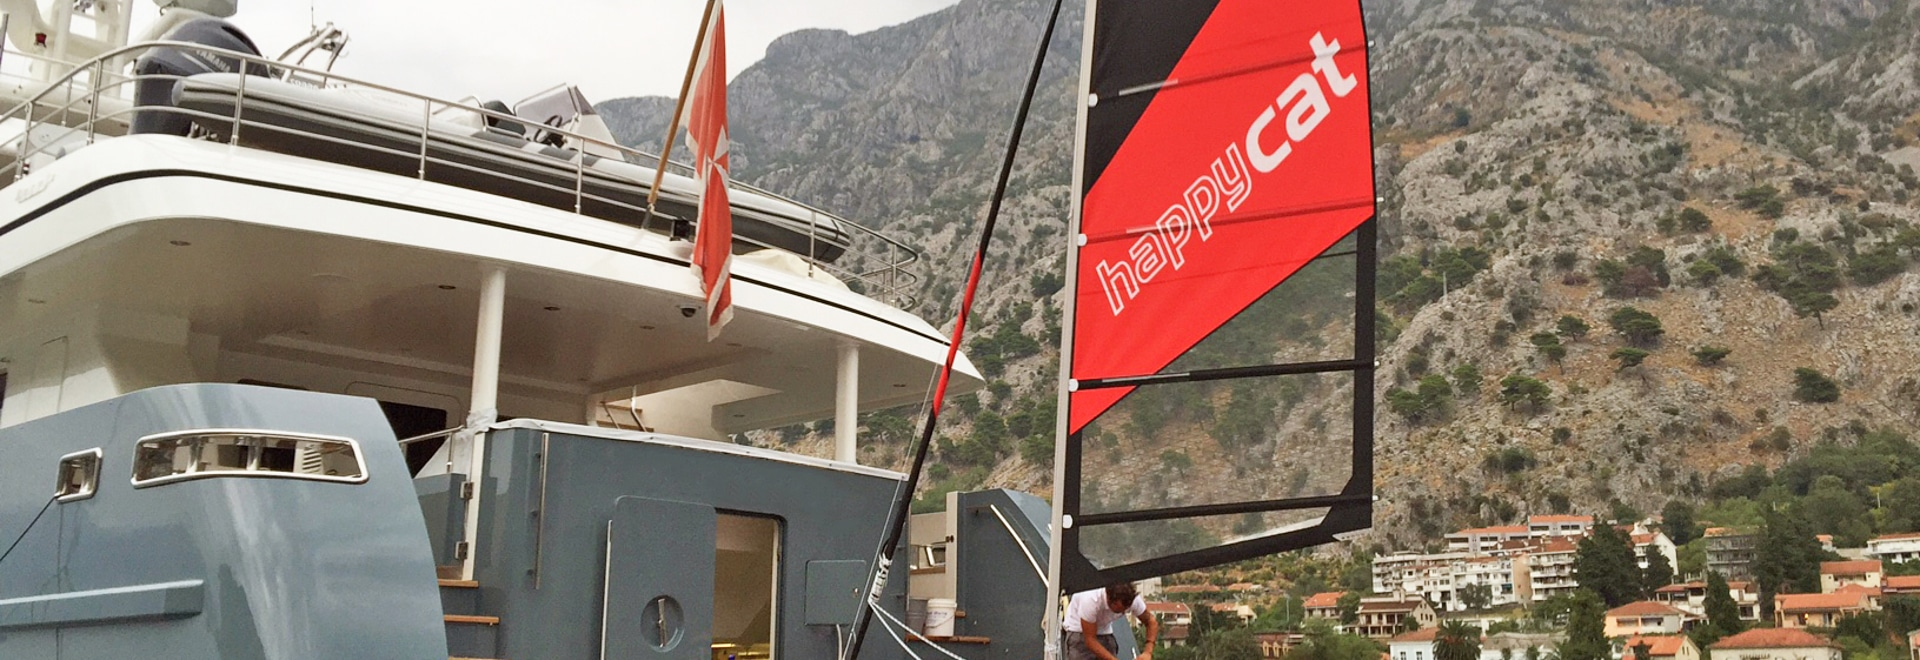 Yacht Toy - HAPPY CAT NEO - catamarano gonfiabile